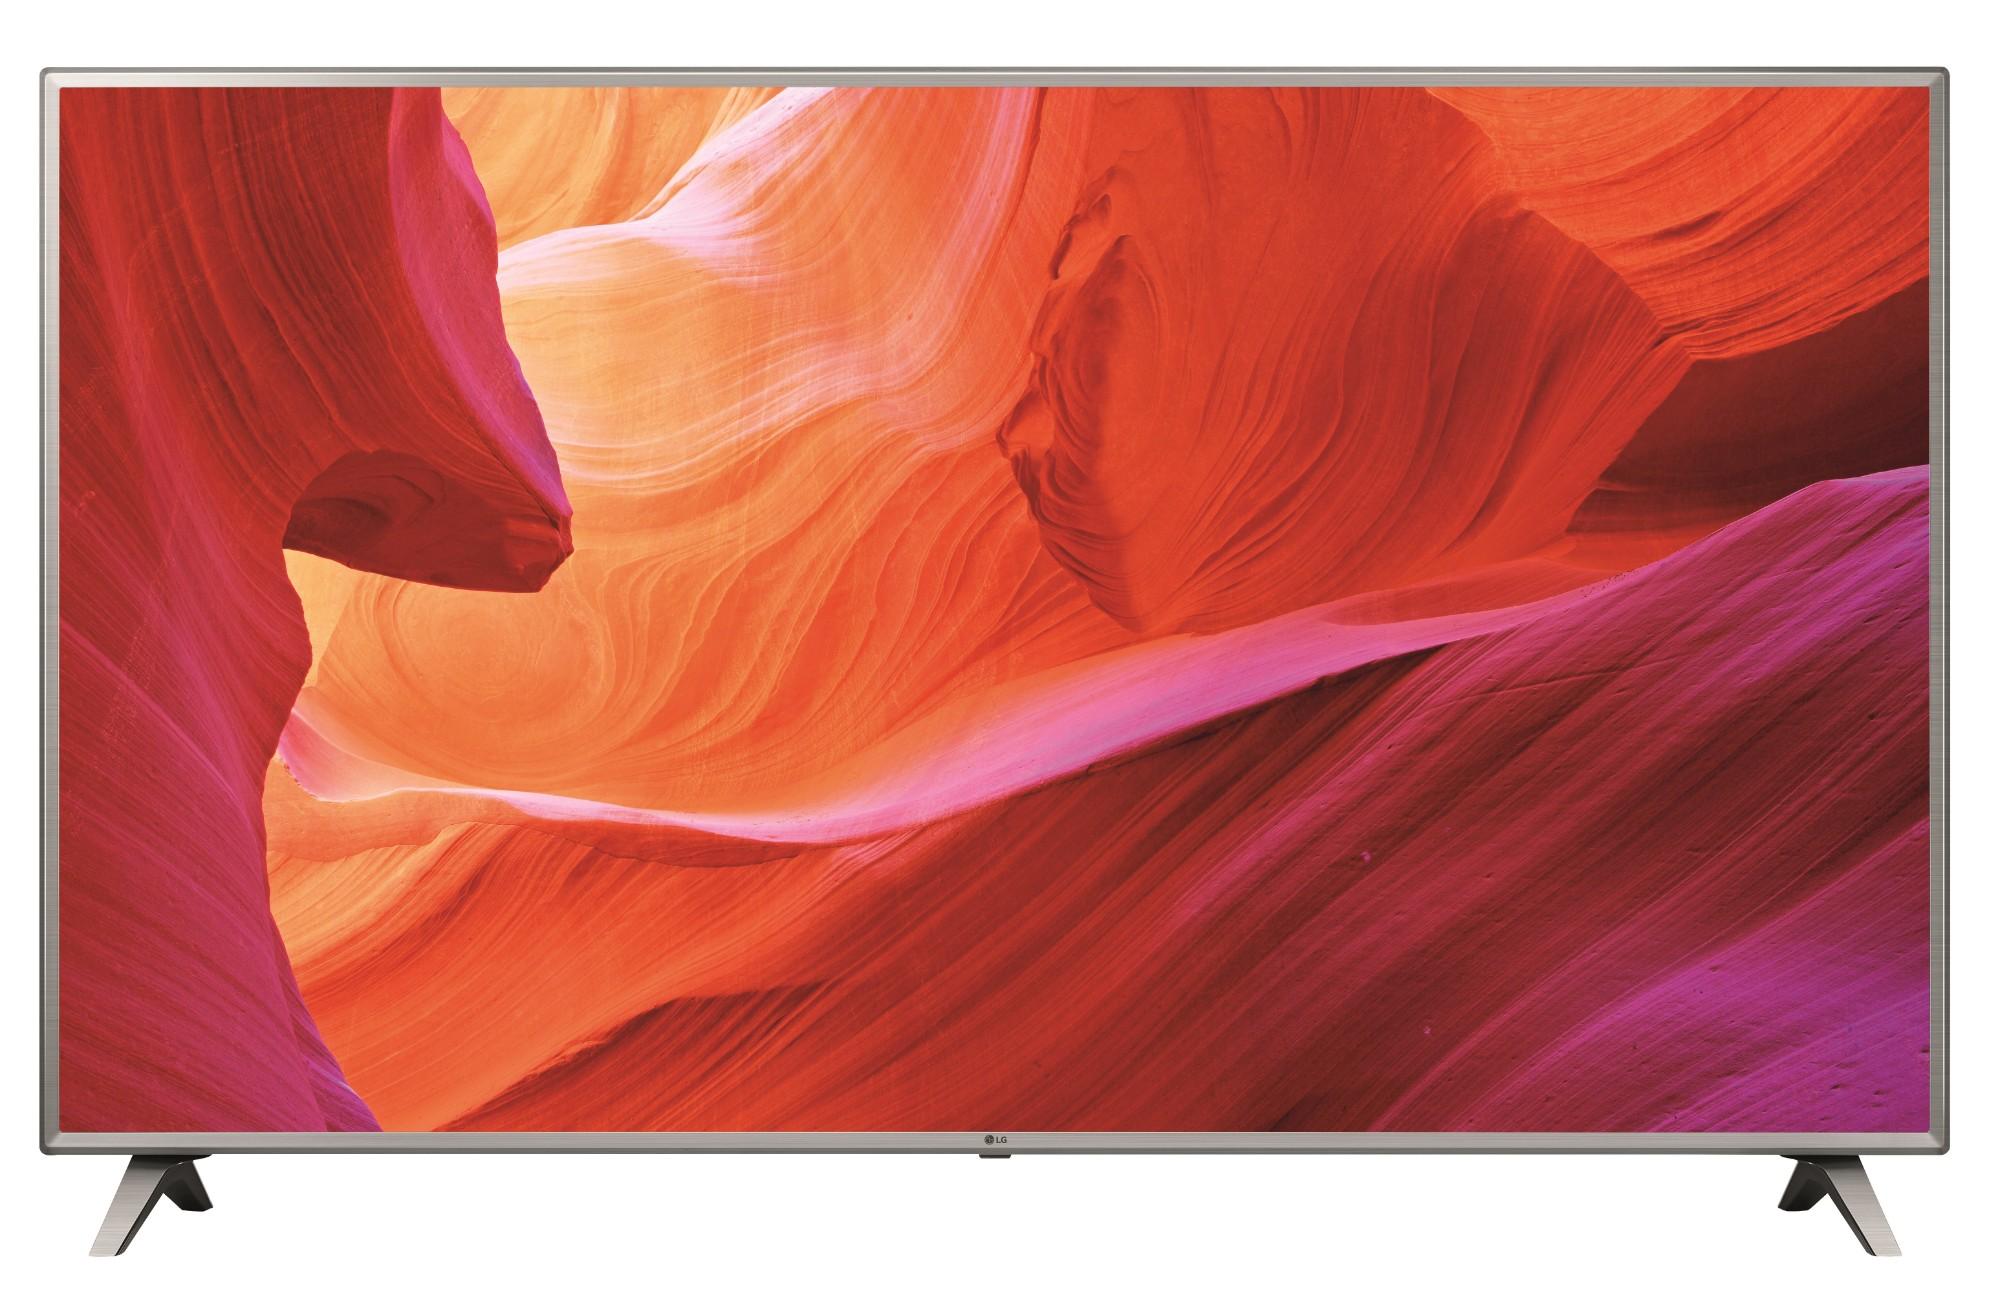 "LG 50UK6500PLA 50"" 4K Ultra HD Smart TV Wi-Fi Grey LED TV"